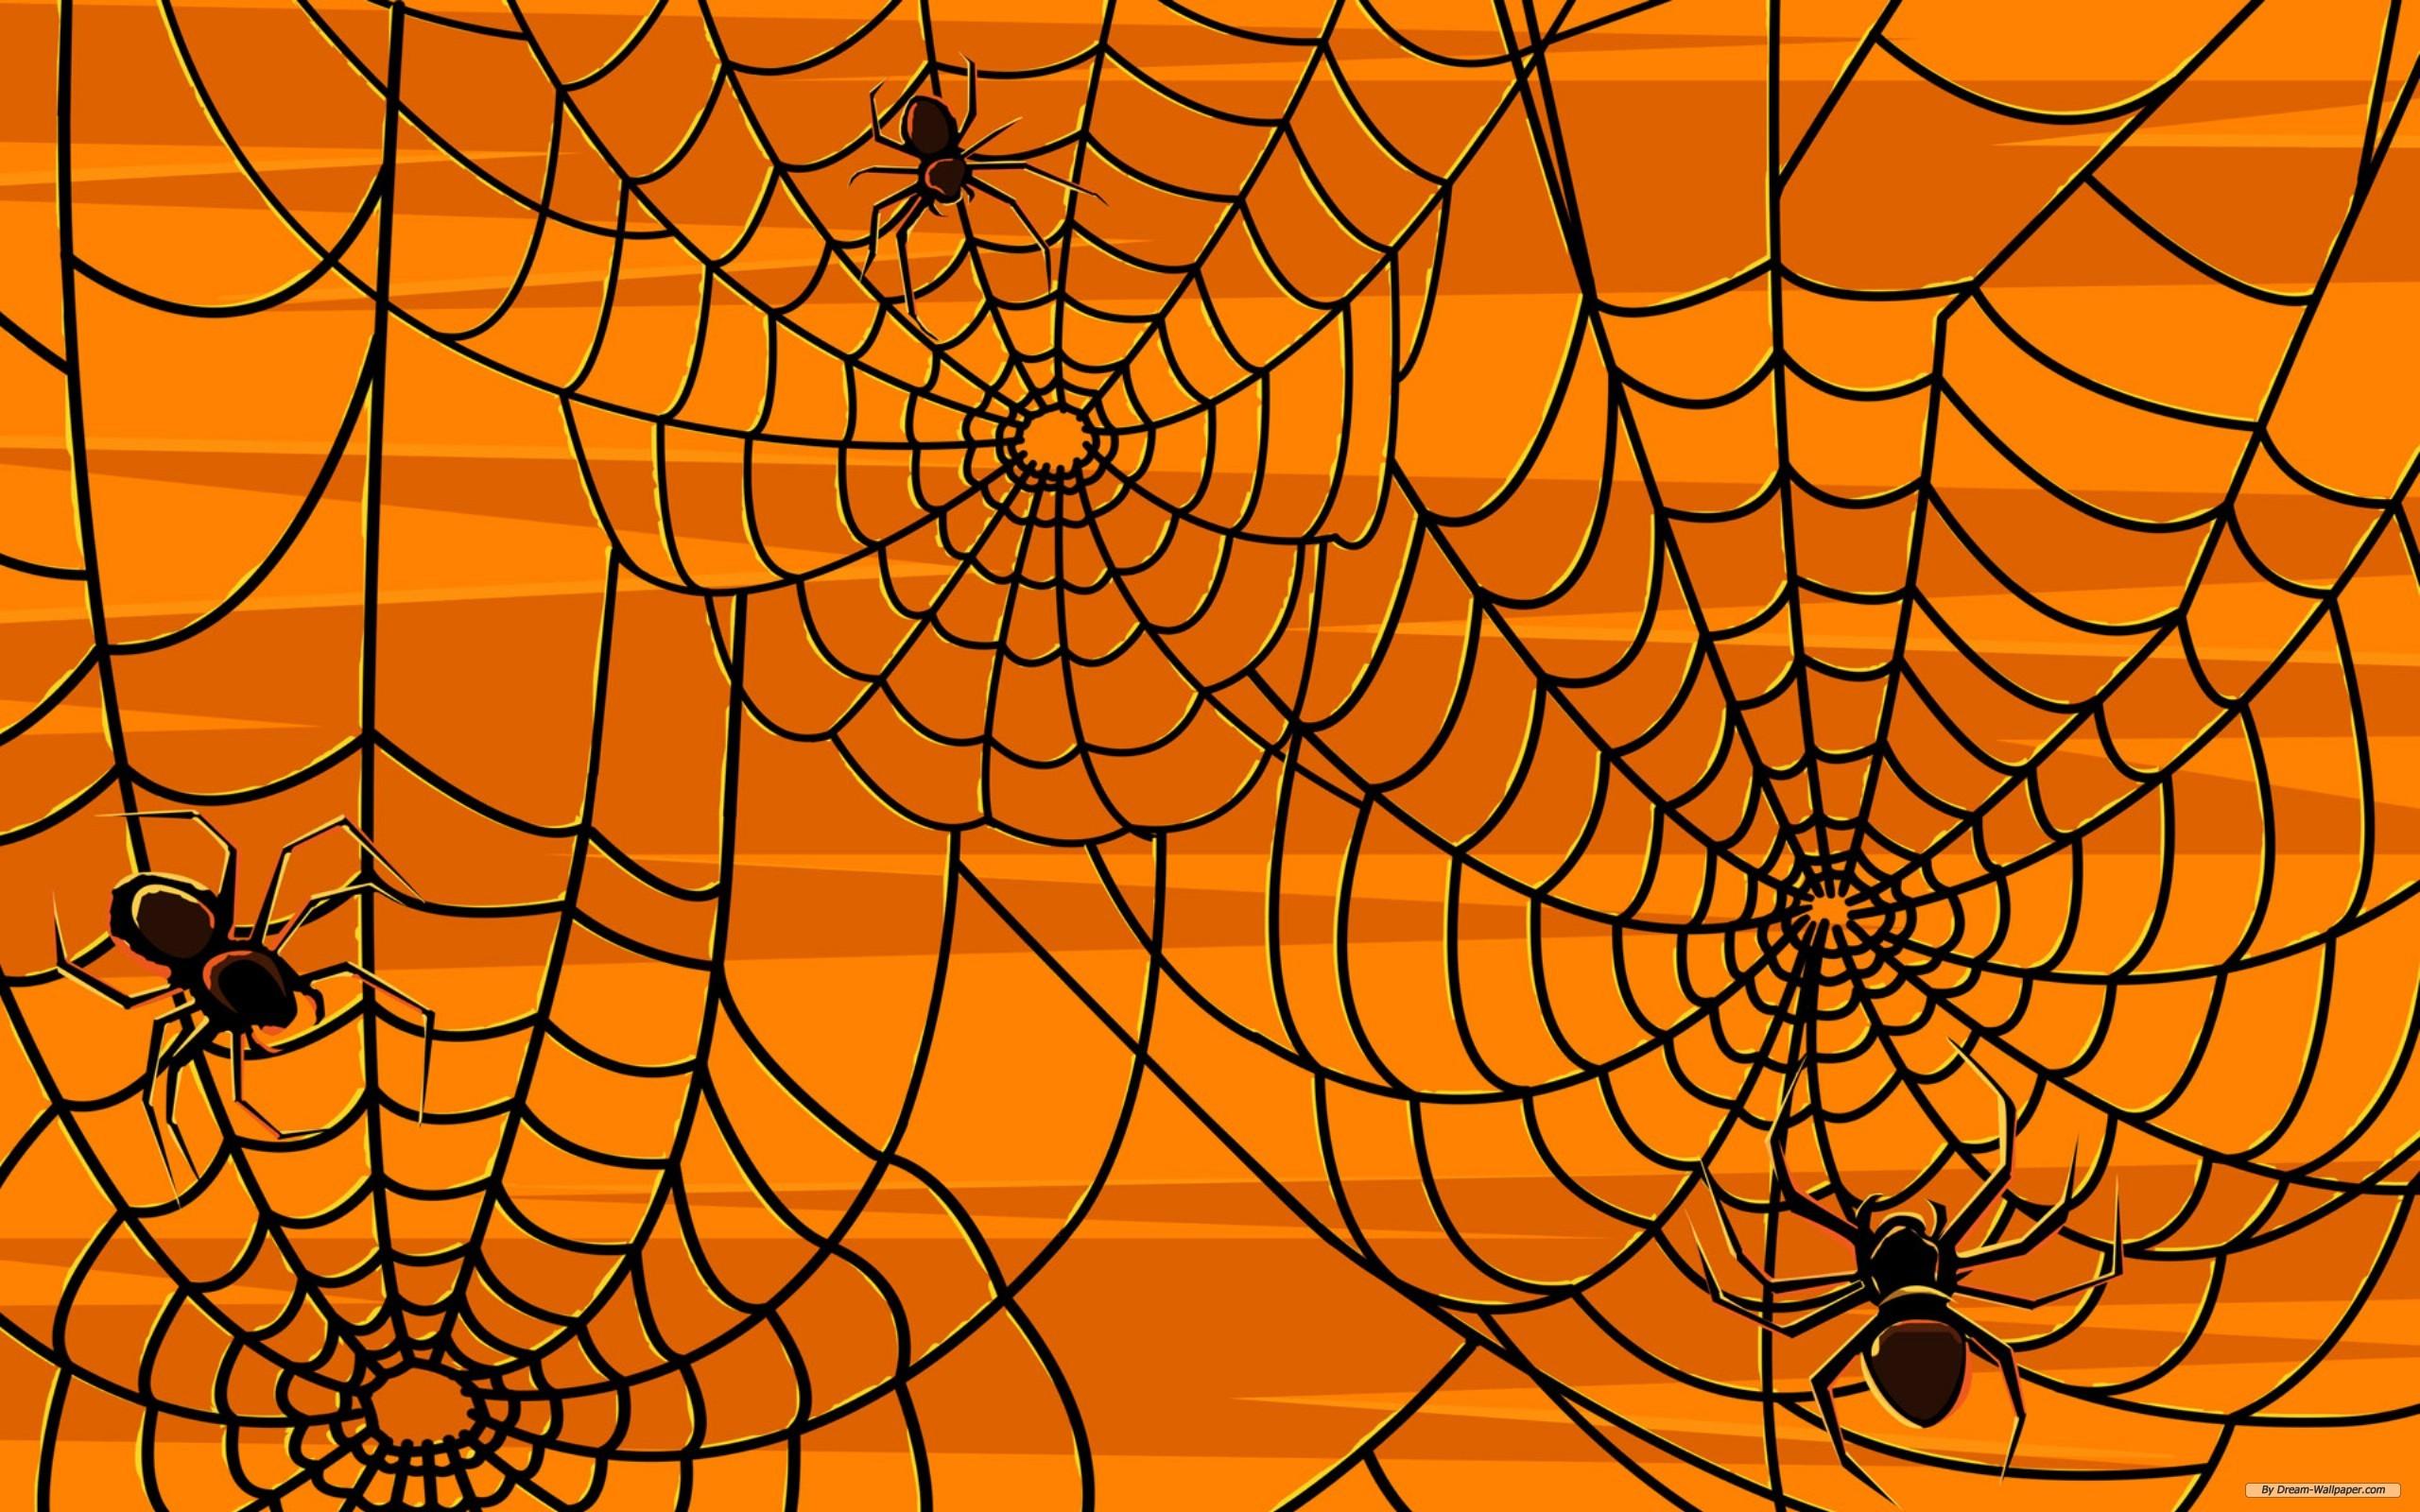 fondos halloween wallpapers gratis - photo #31